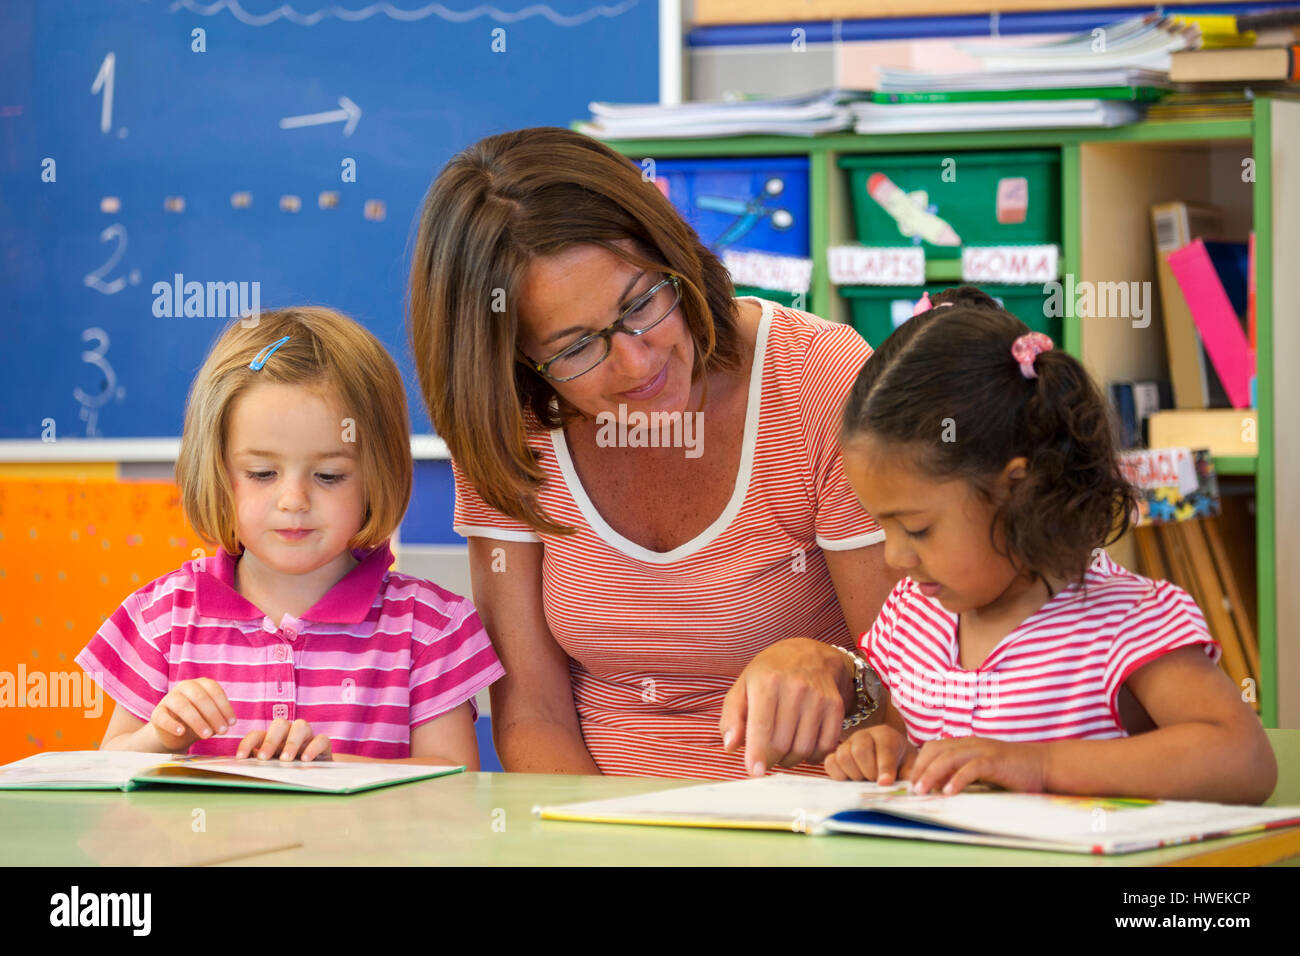 Preschool girls and teacher reading storybook in classroom - Stock Image